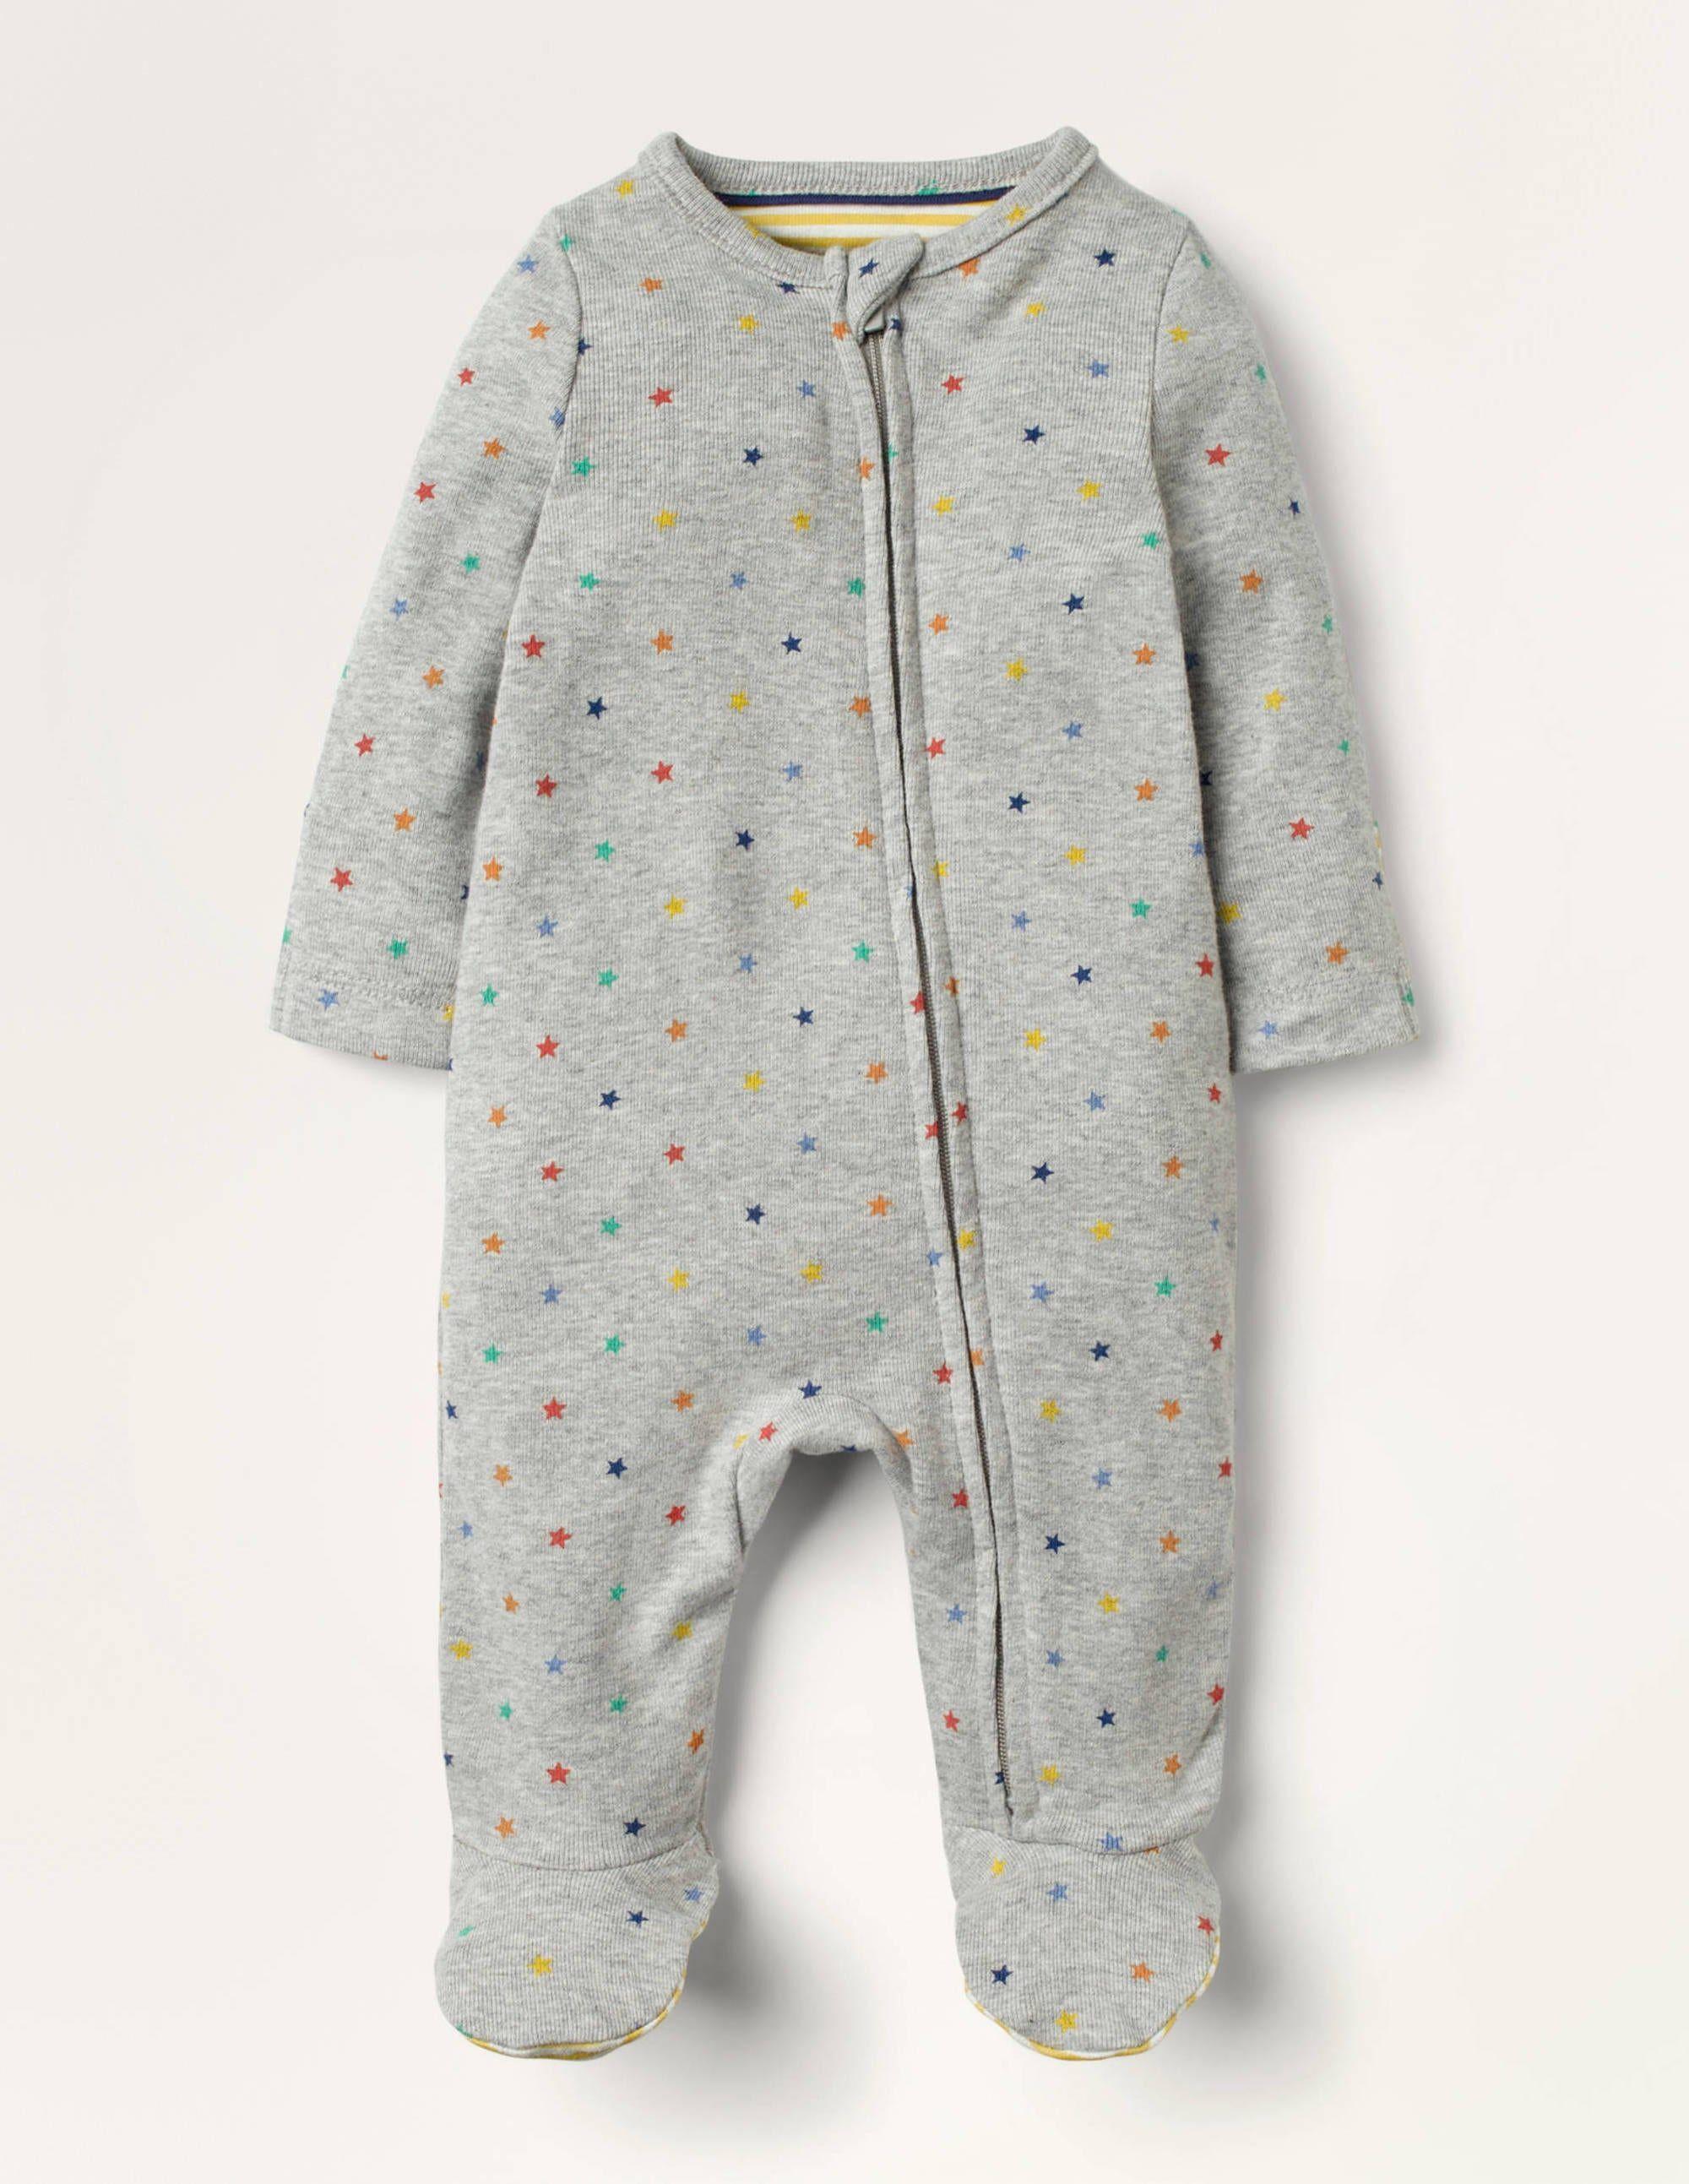 Baby Grenouillère zippée ultra-douce à motif étoile GRY Bébé Boden, Grey - 9-12m